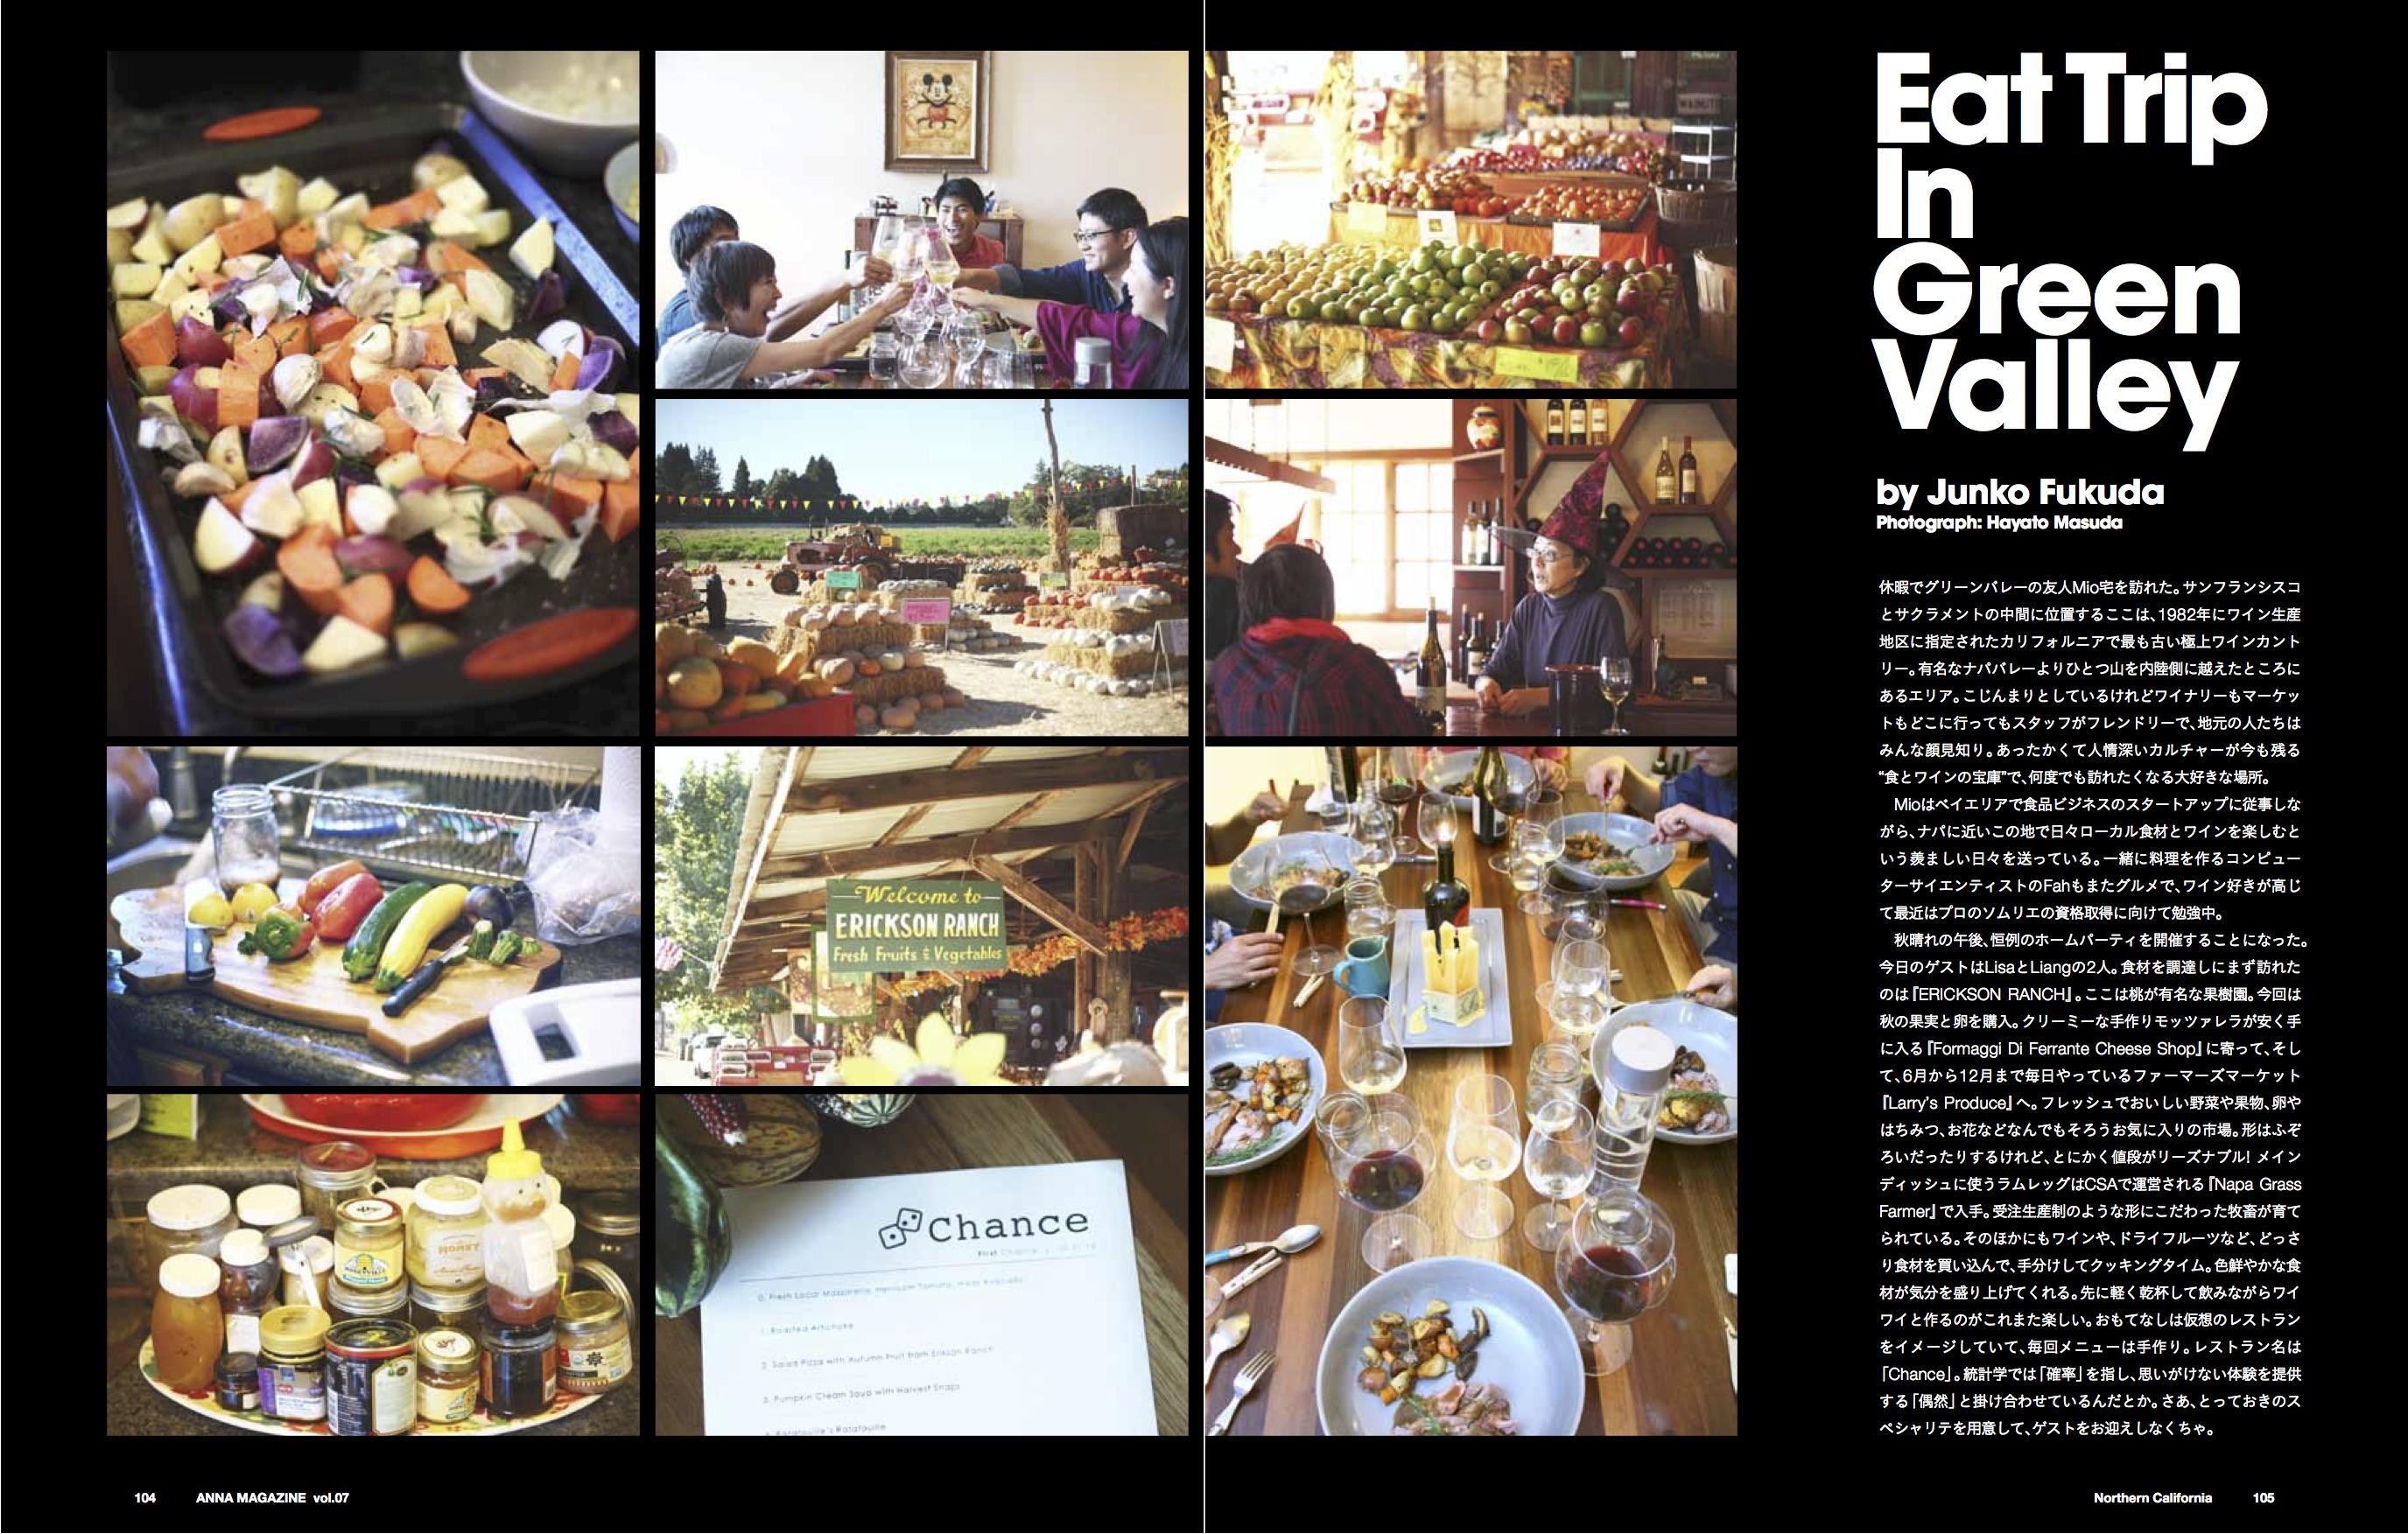 anna magazine vol.7 P28